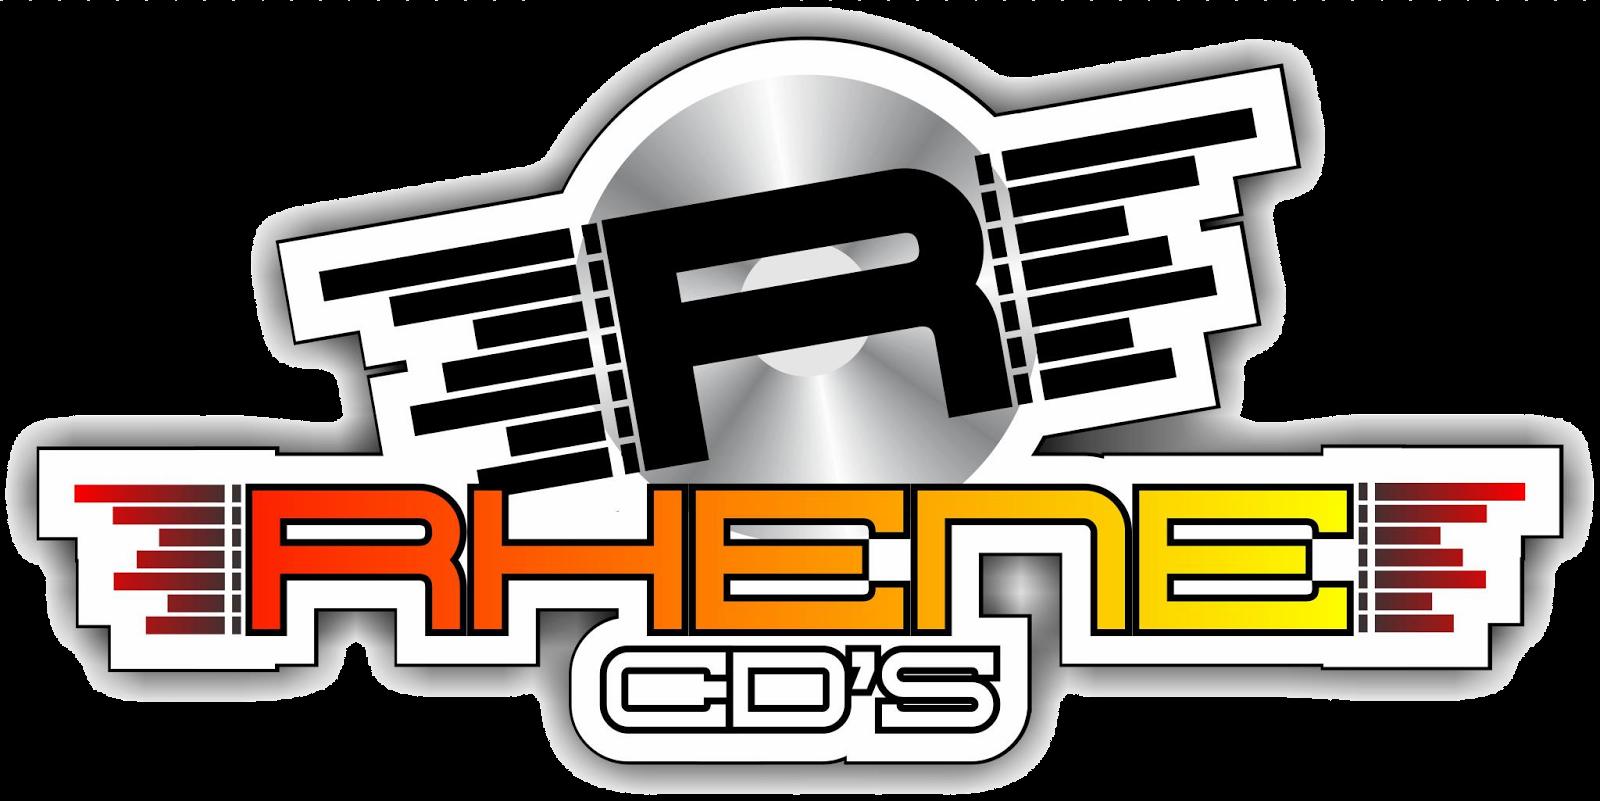 Rhene Cd's